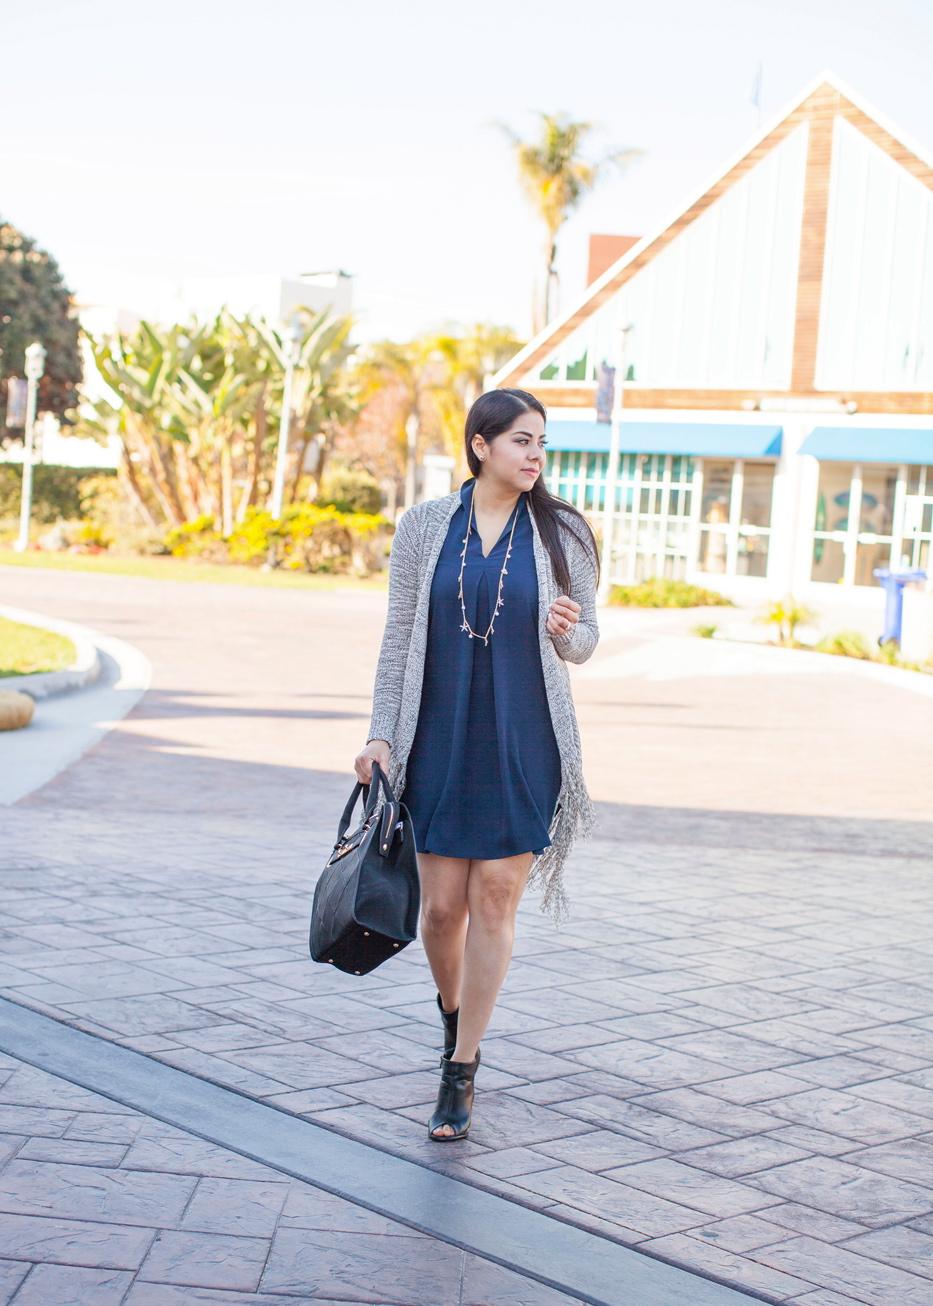 San Diego Street Style, so cal fashion blogger, so cal style